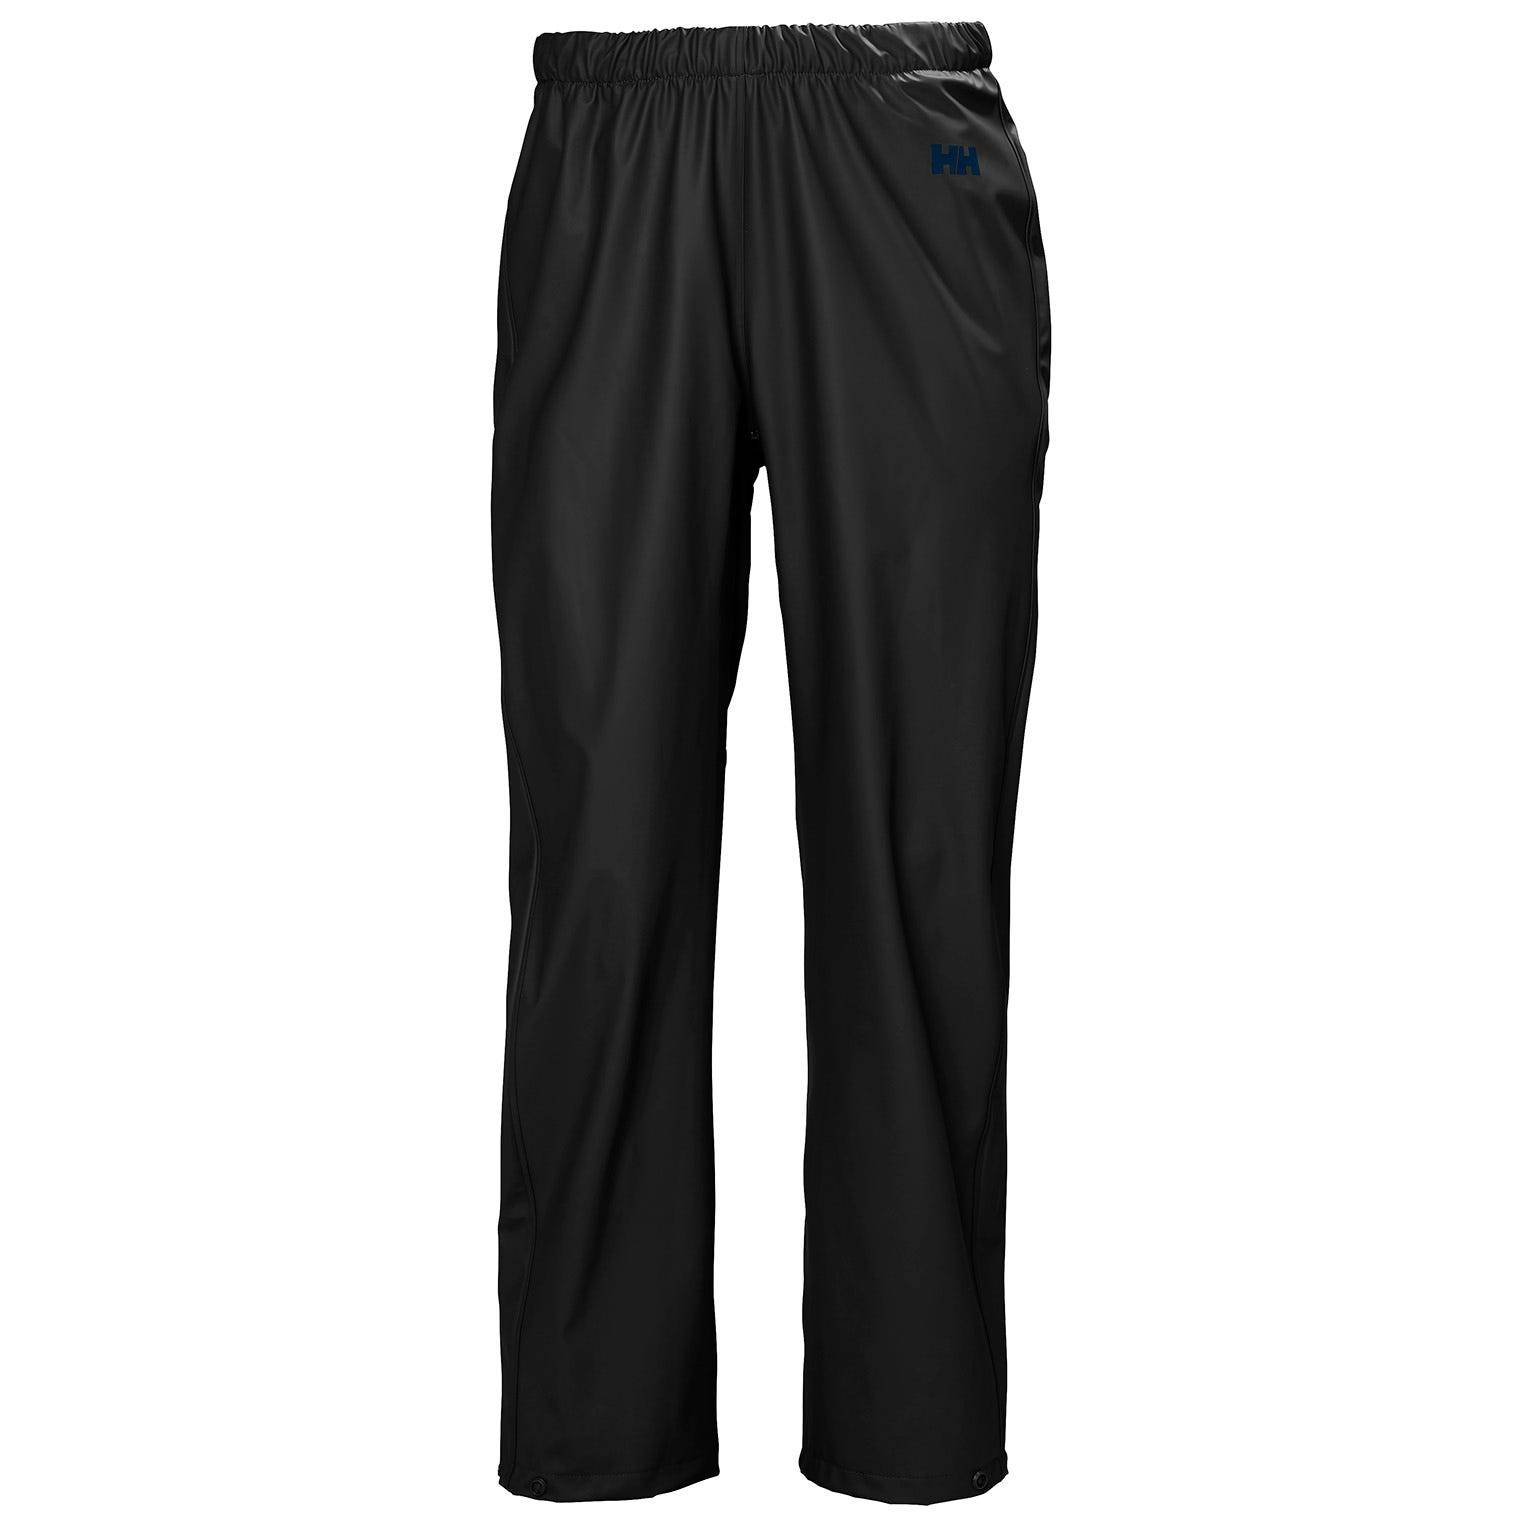 Helly Hansen W Loke Pants Womens Hiking Pant Black XL